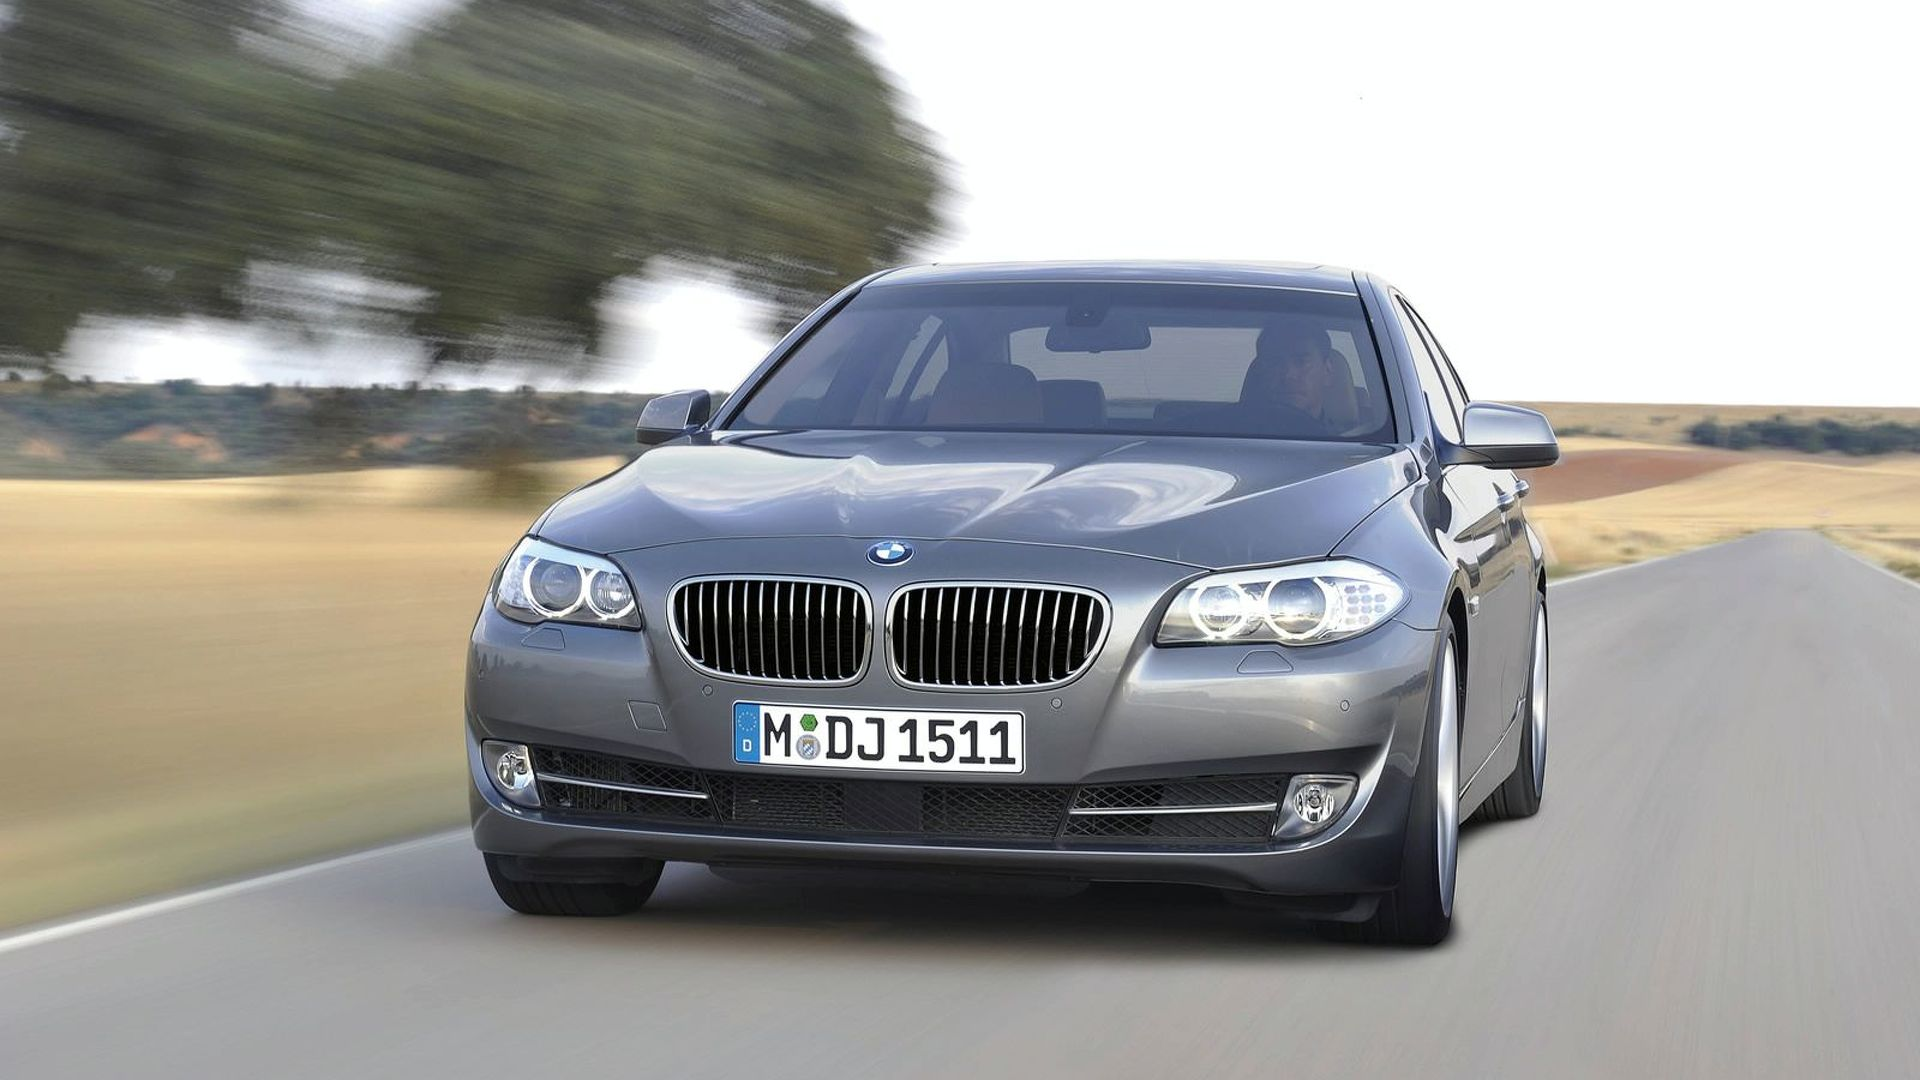 BMW M550dX won't be an official M car